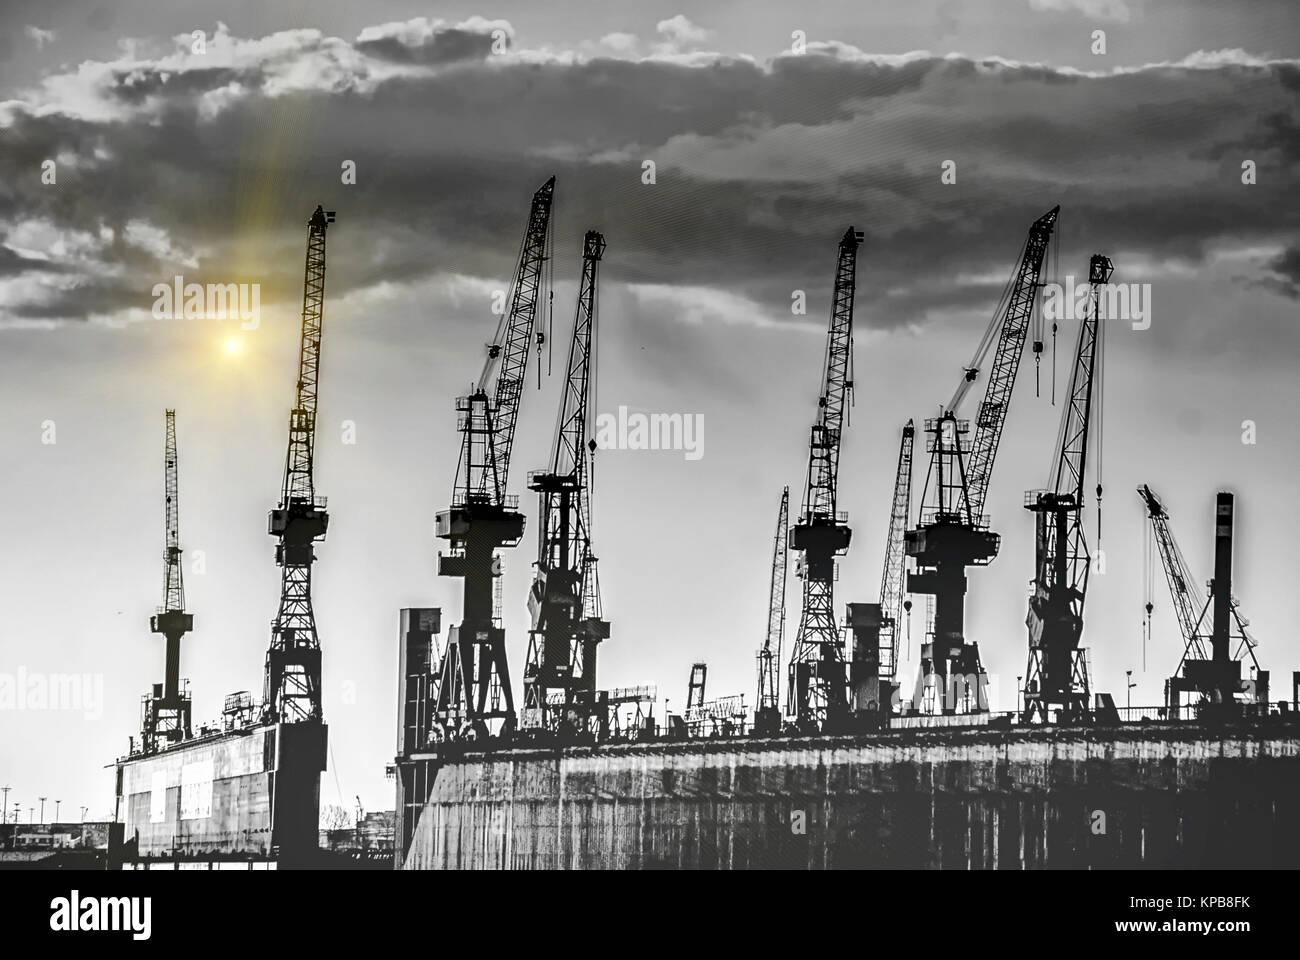 Hamburg Harbor Cranes in Sunset - Stock Image